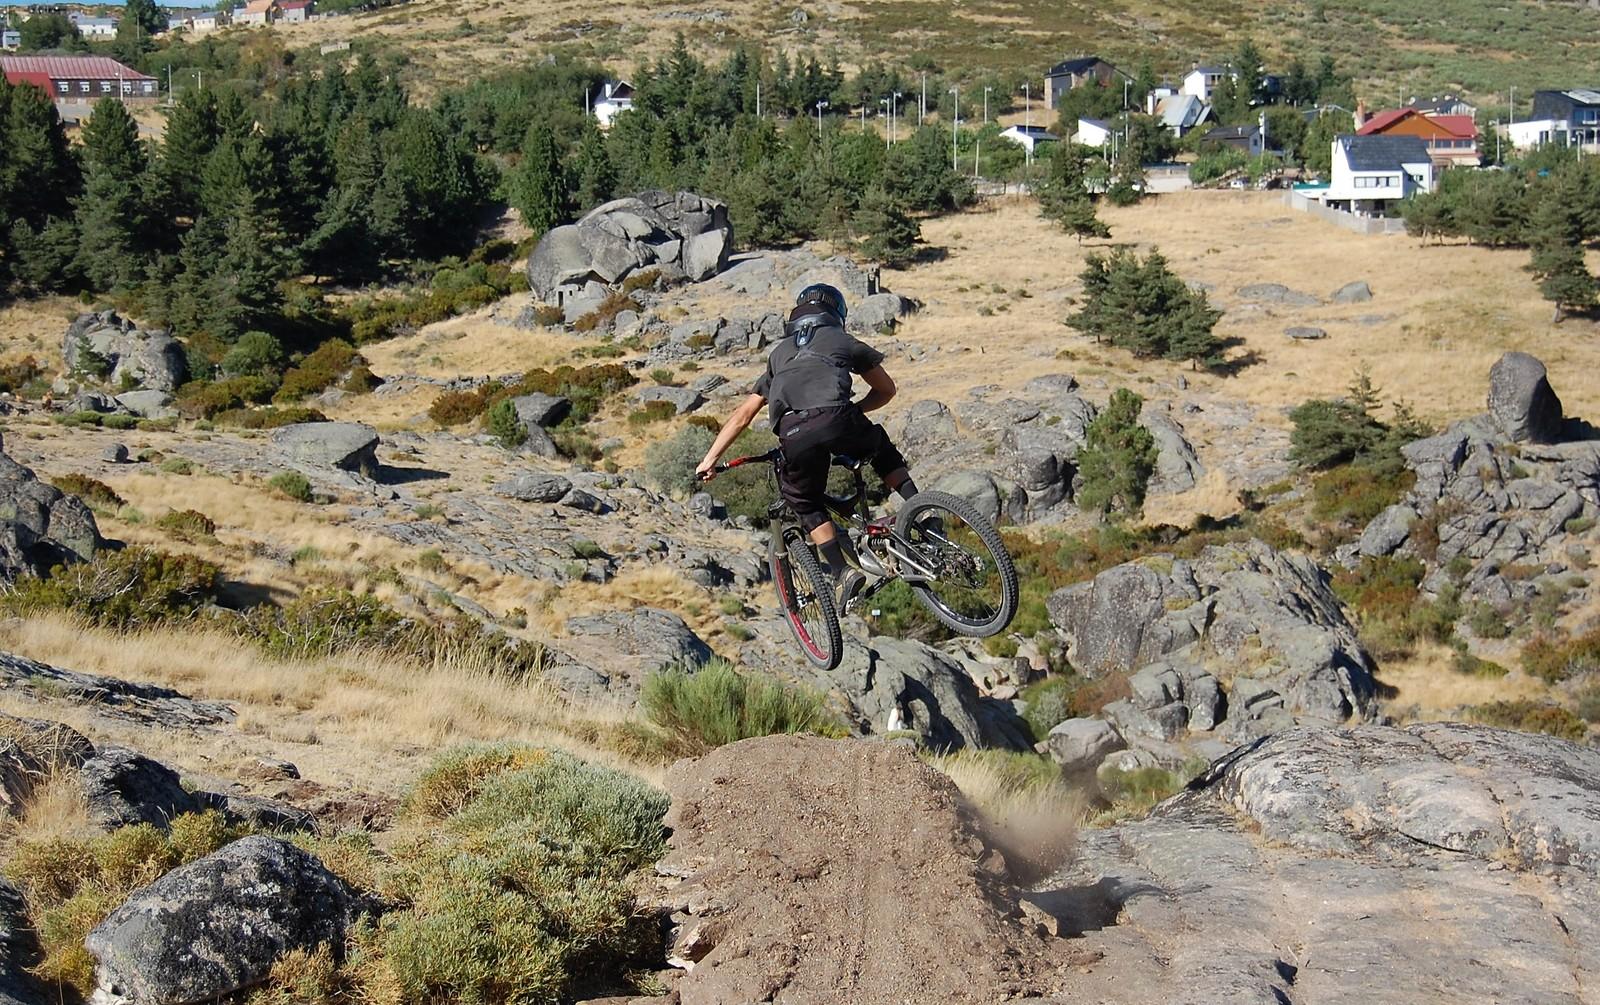 Penhas - antonio.mendes.3363 - Mountain Biking Pictures - Vital MTB